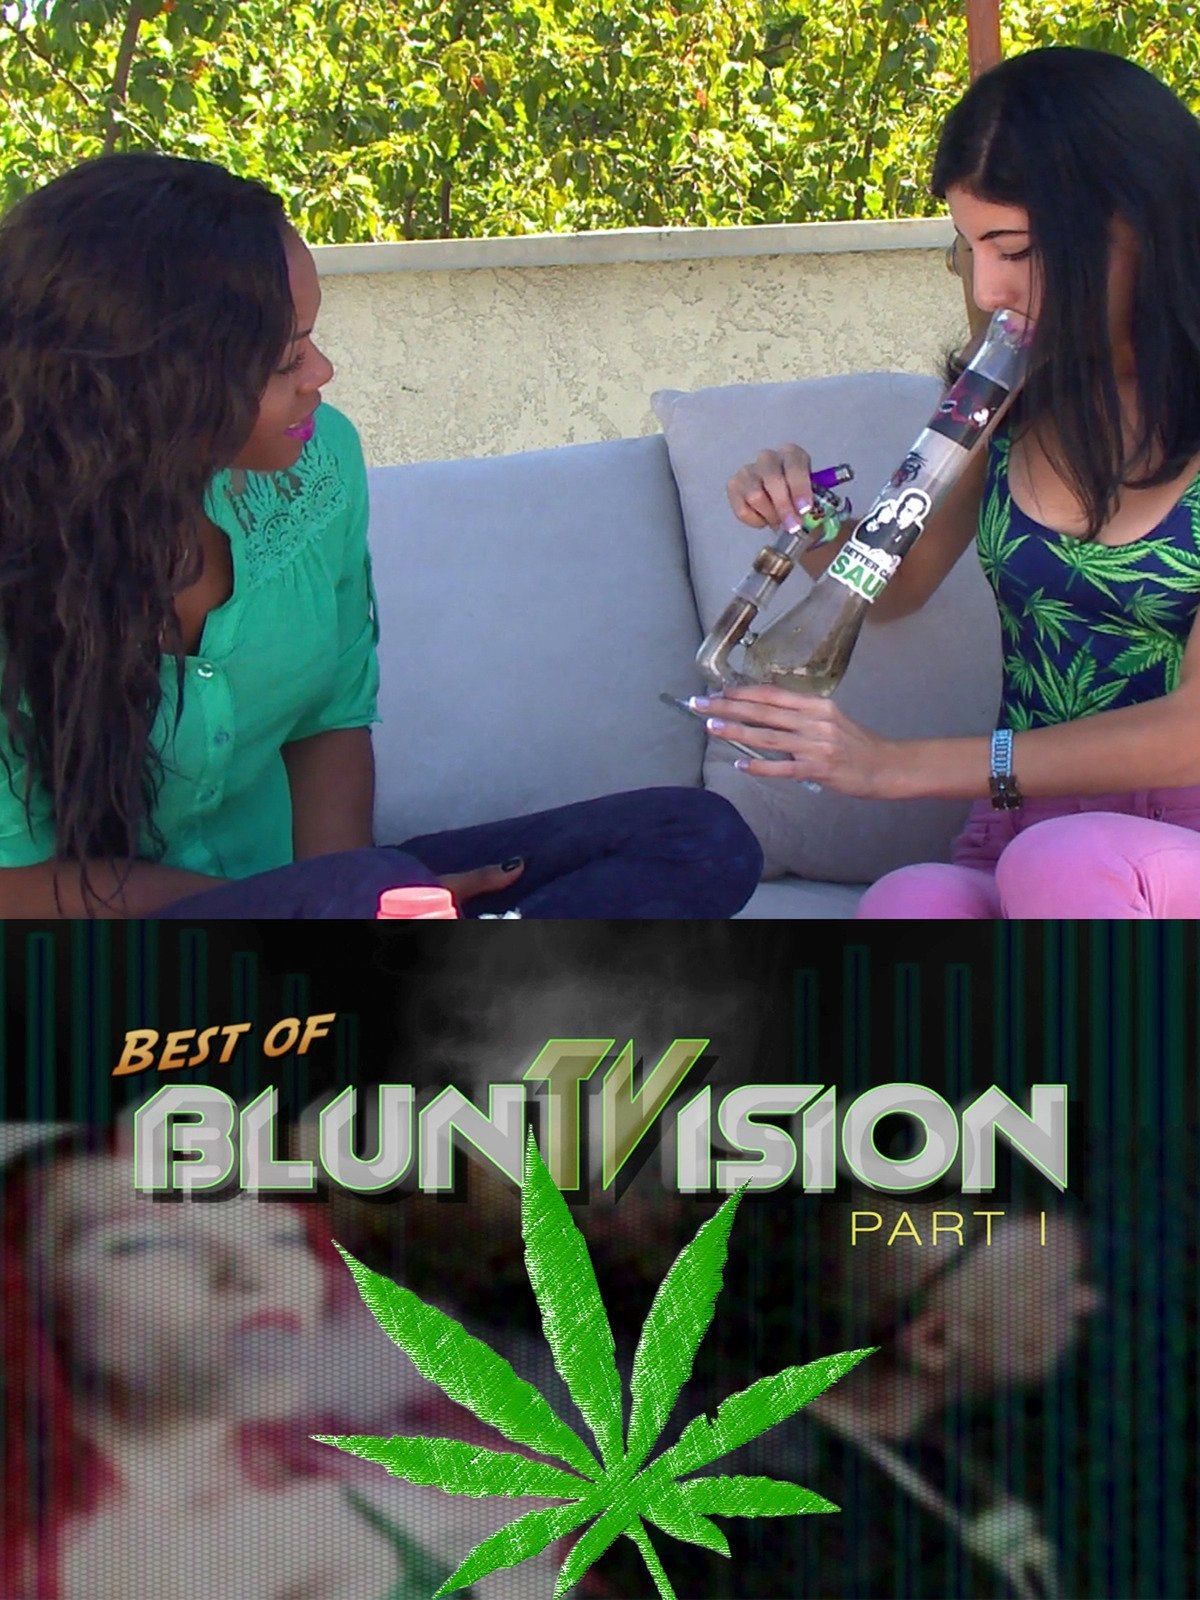 BluntVision: Part 1